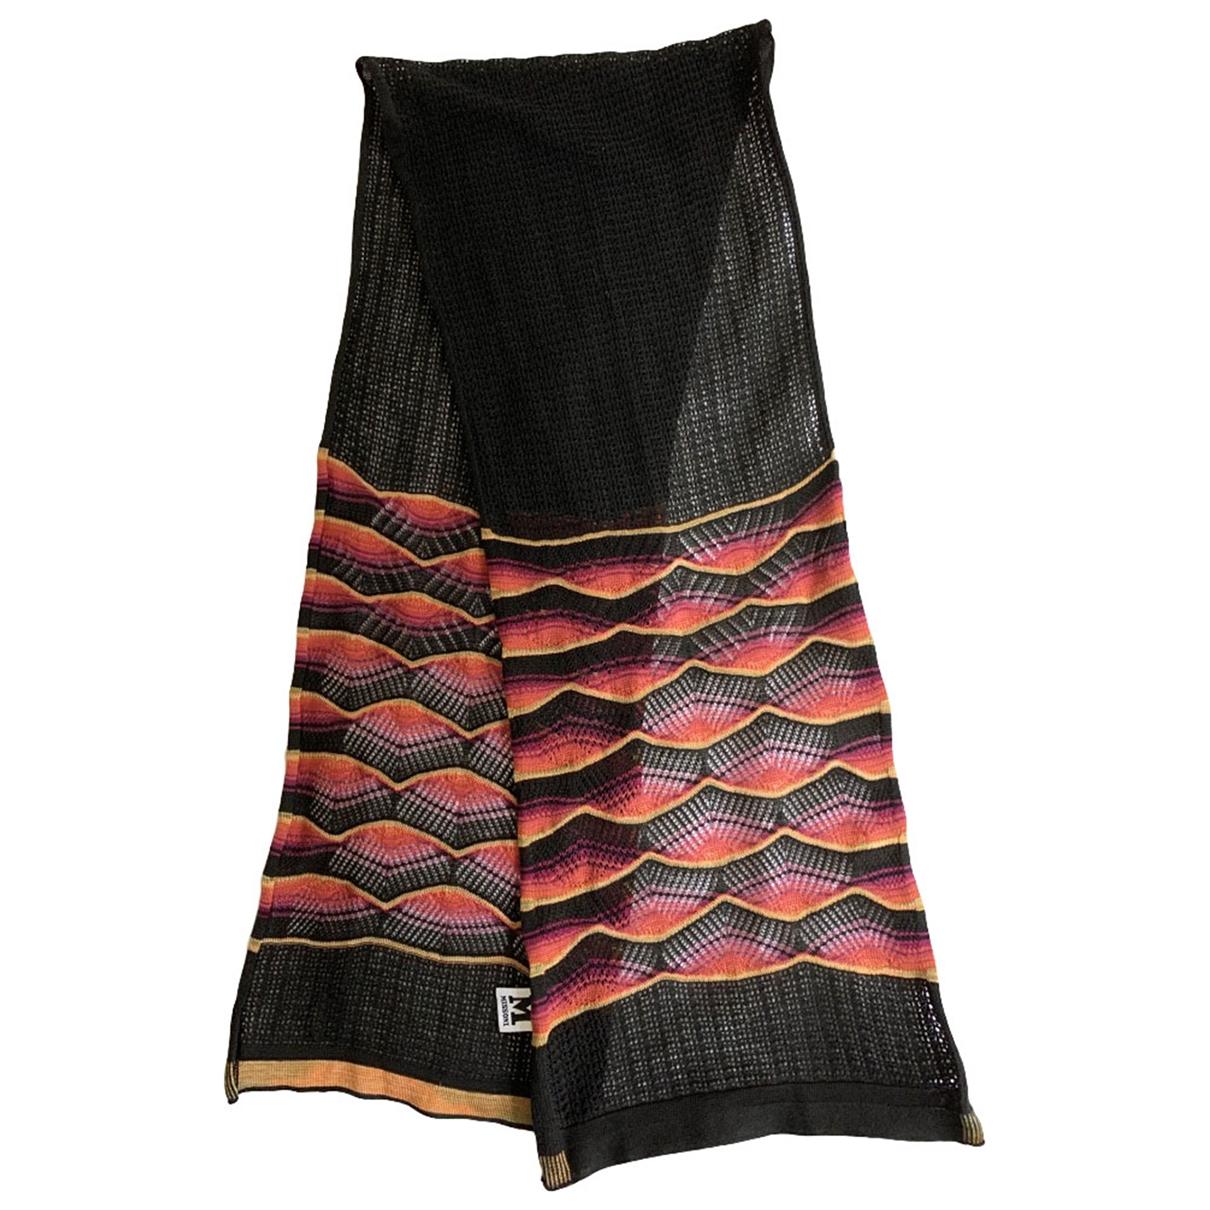 M Missoni \N Black scarf for Women \N